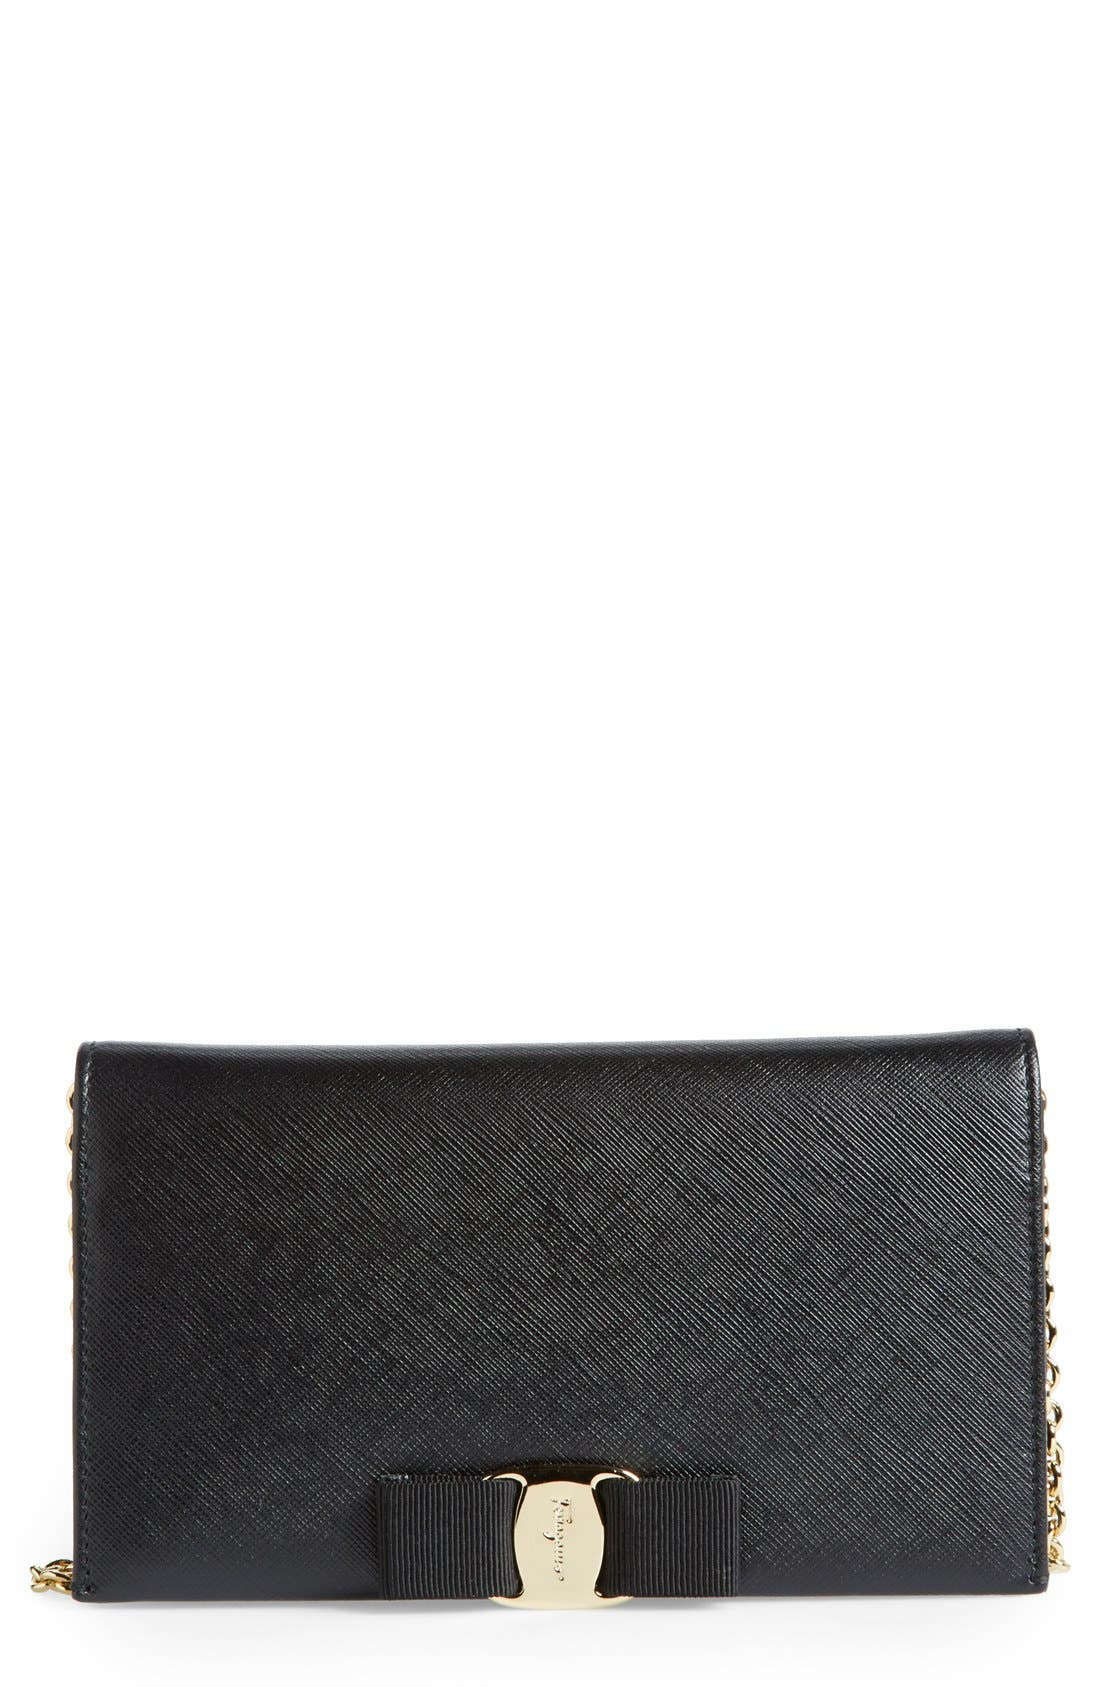 Main Image - Salavatore Ferragamo Vara Leather Wallet on a Chain